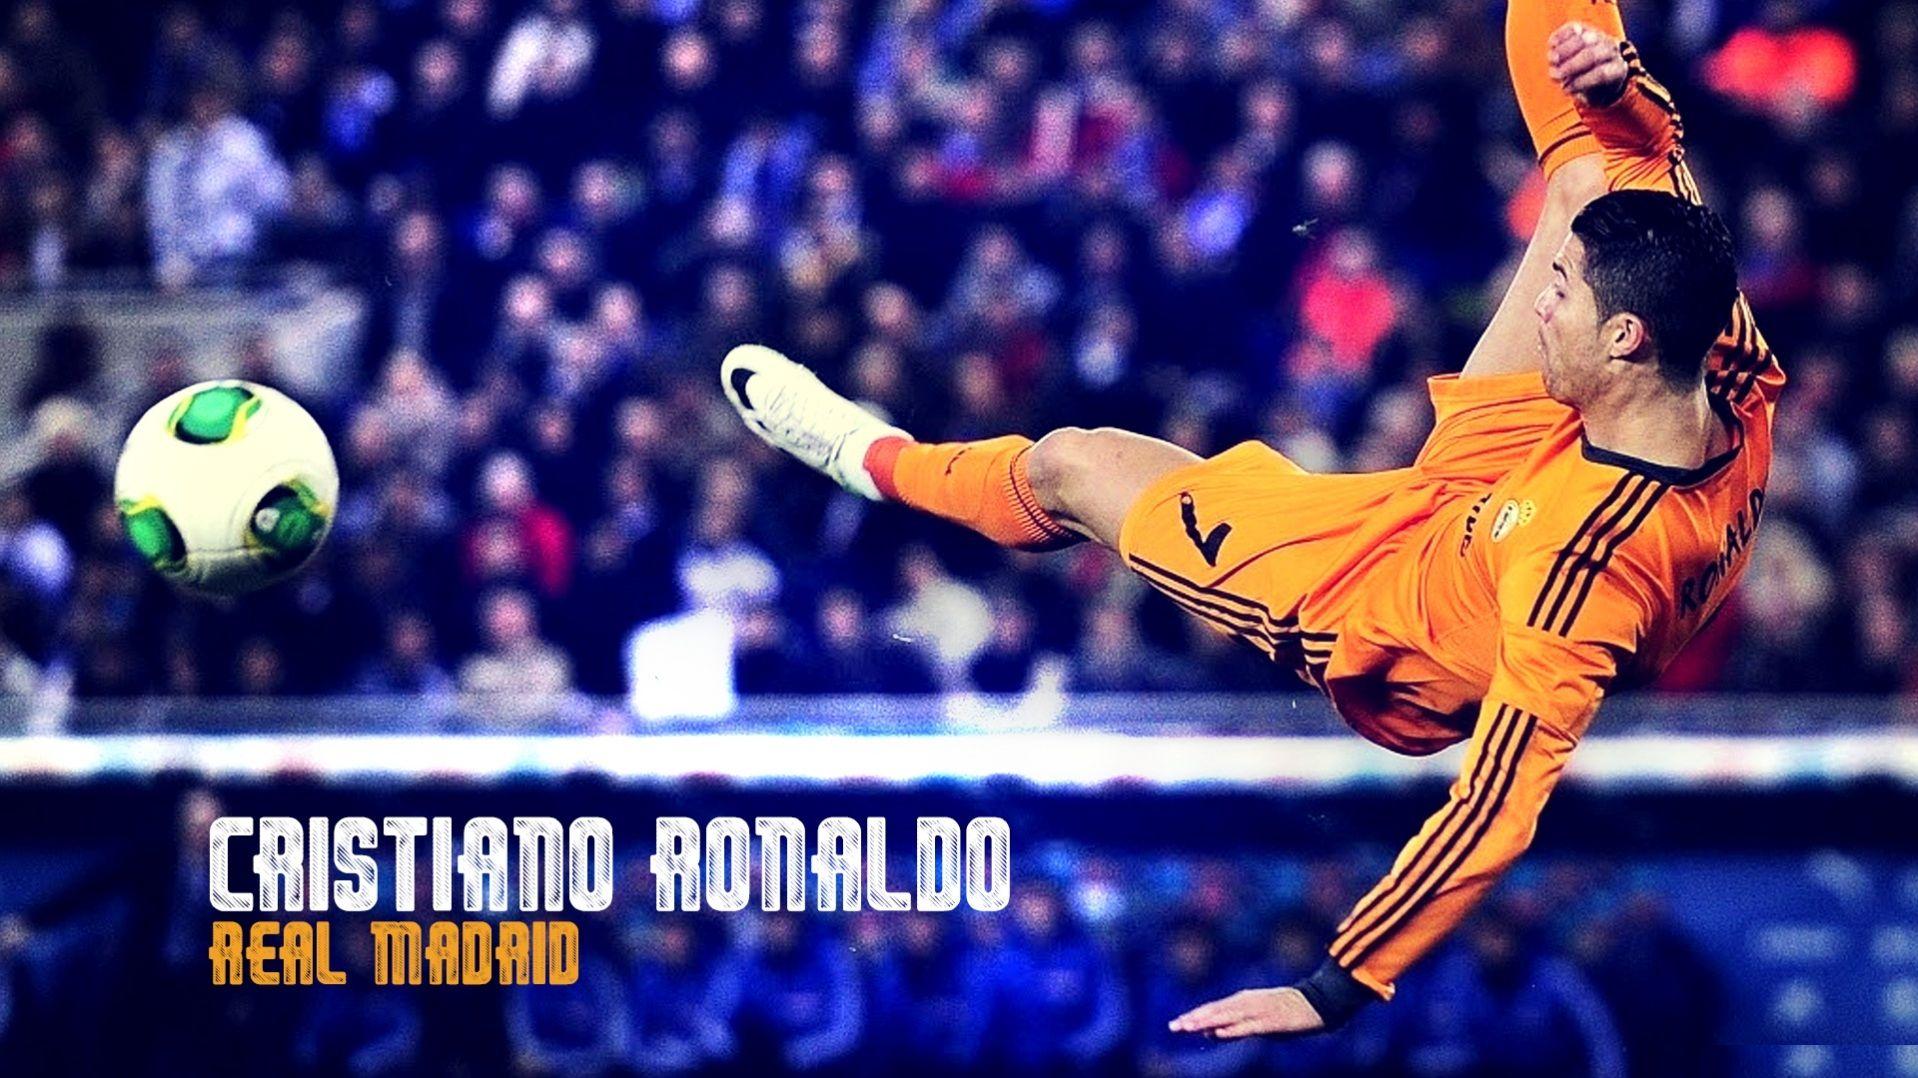 Cristiano Ronaldo Bicycle Kick Wallpaper Cristiano Ronaldo